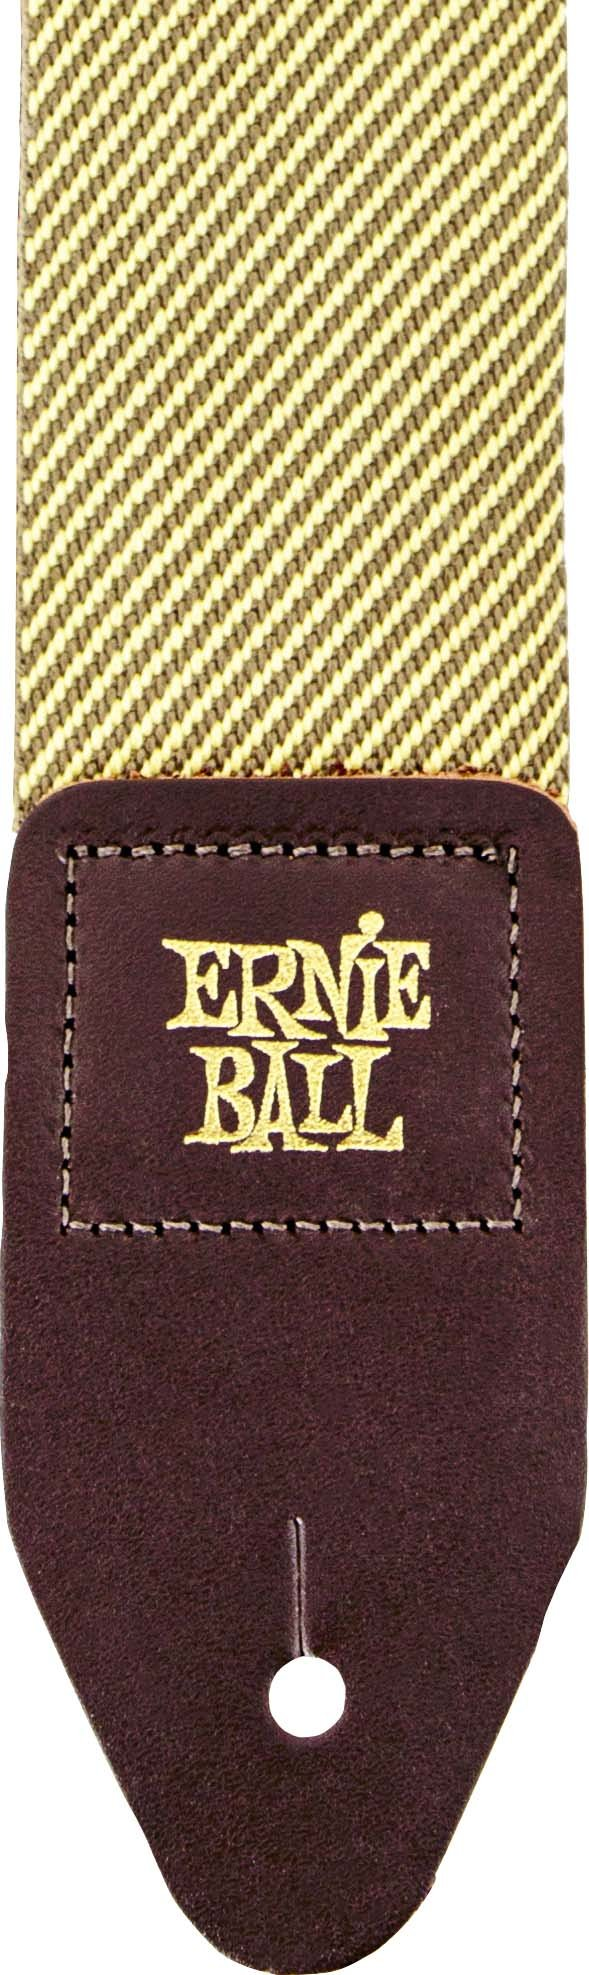 Ernie Ball Barcelona Jacquard correa para la guitarra: Amazon.es ...